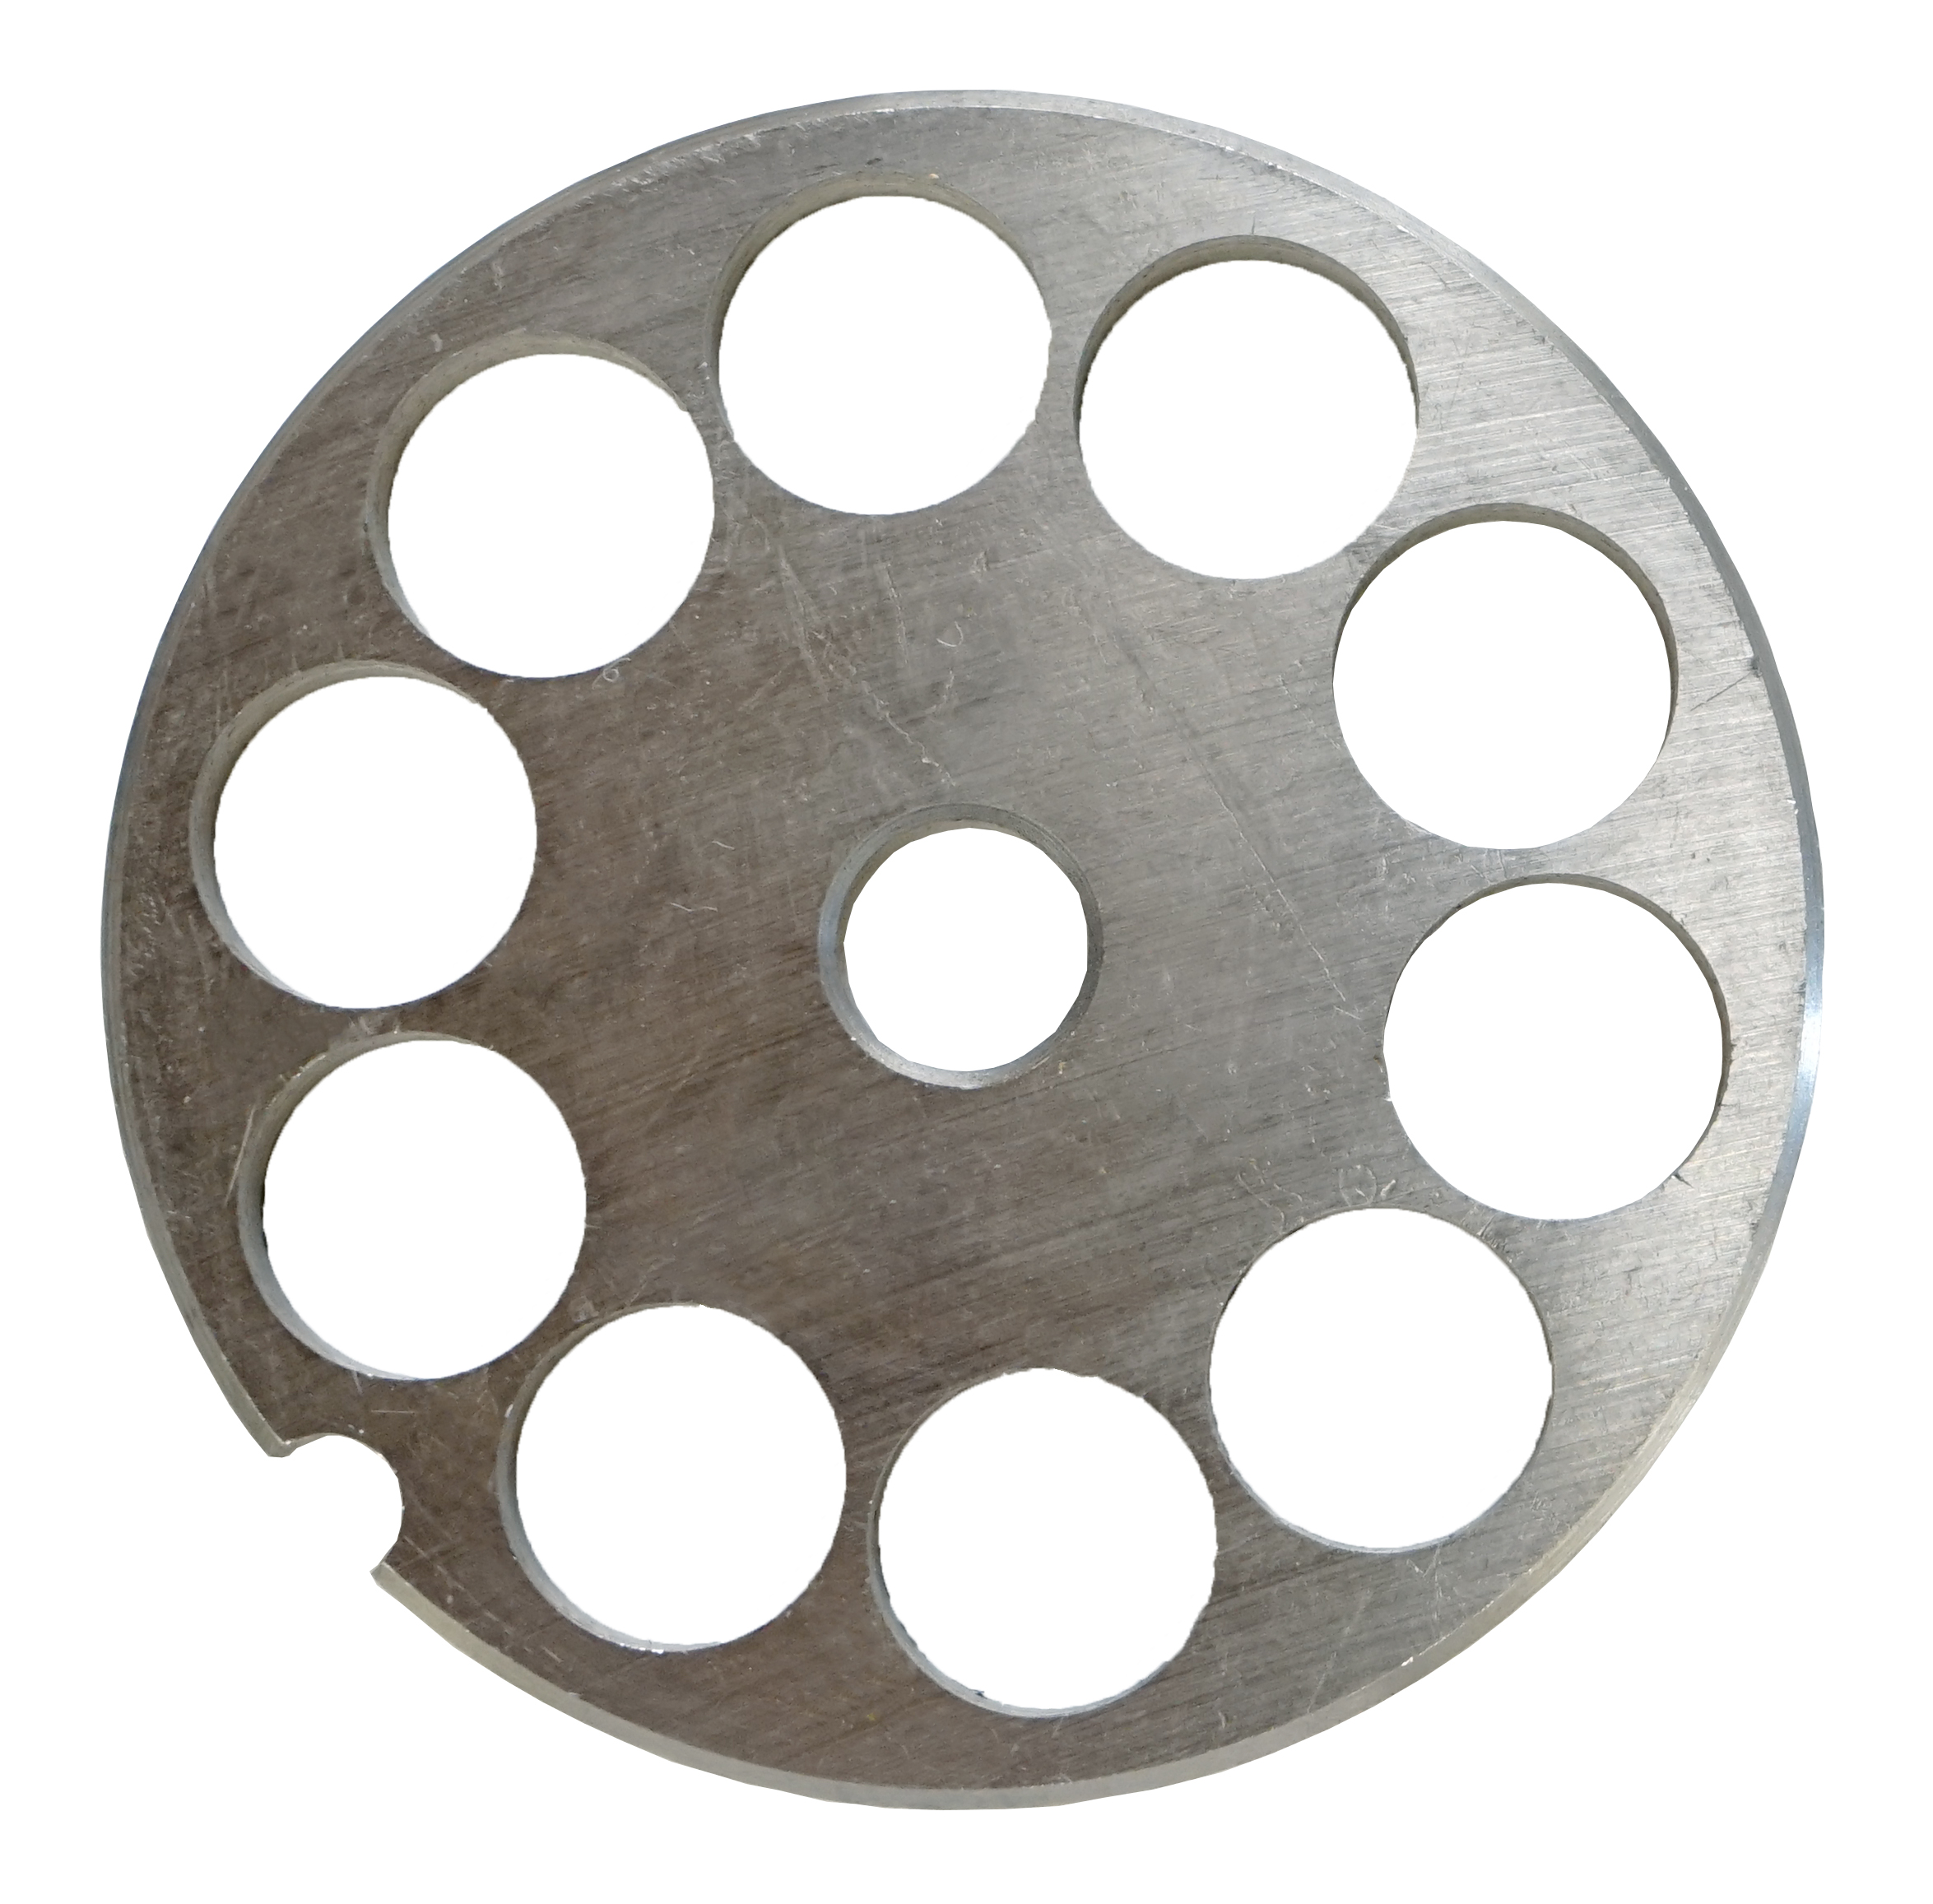 Globe L00775 meat grinder, accessories